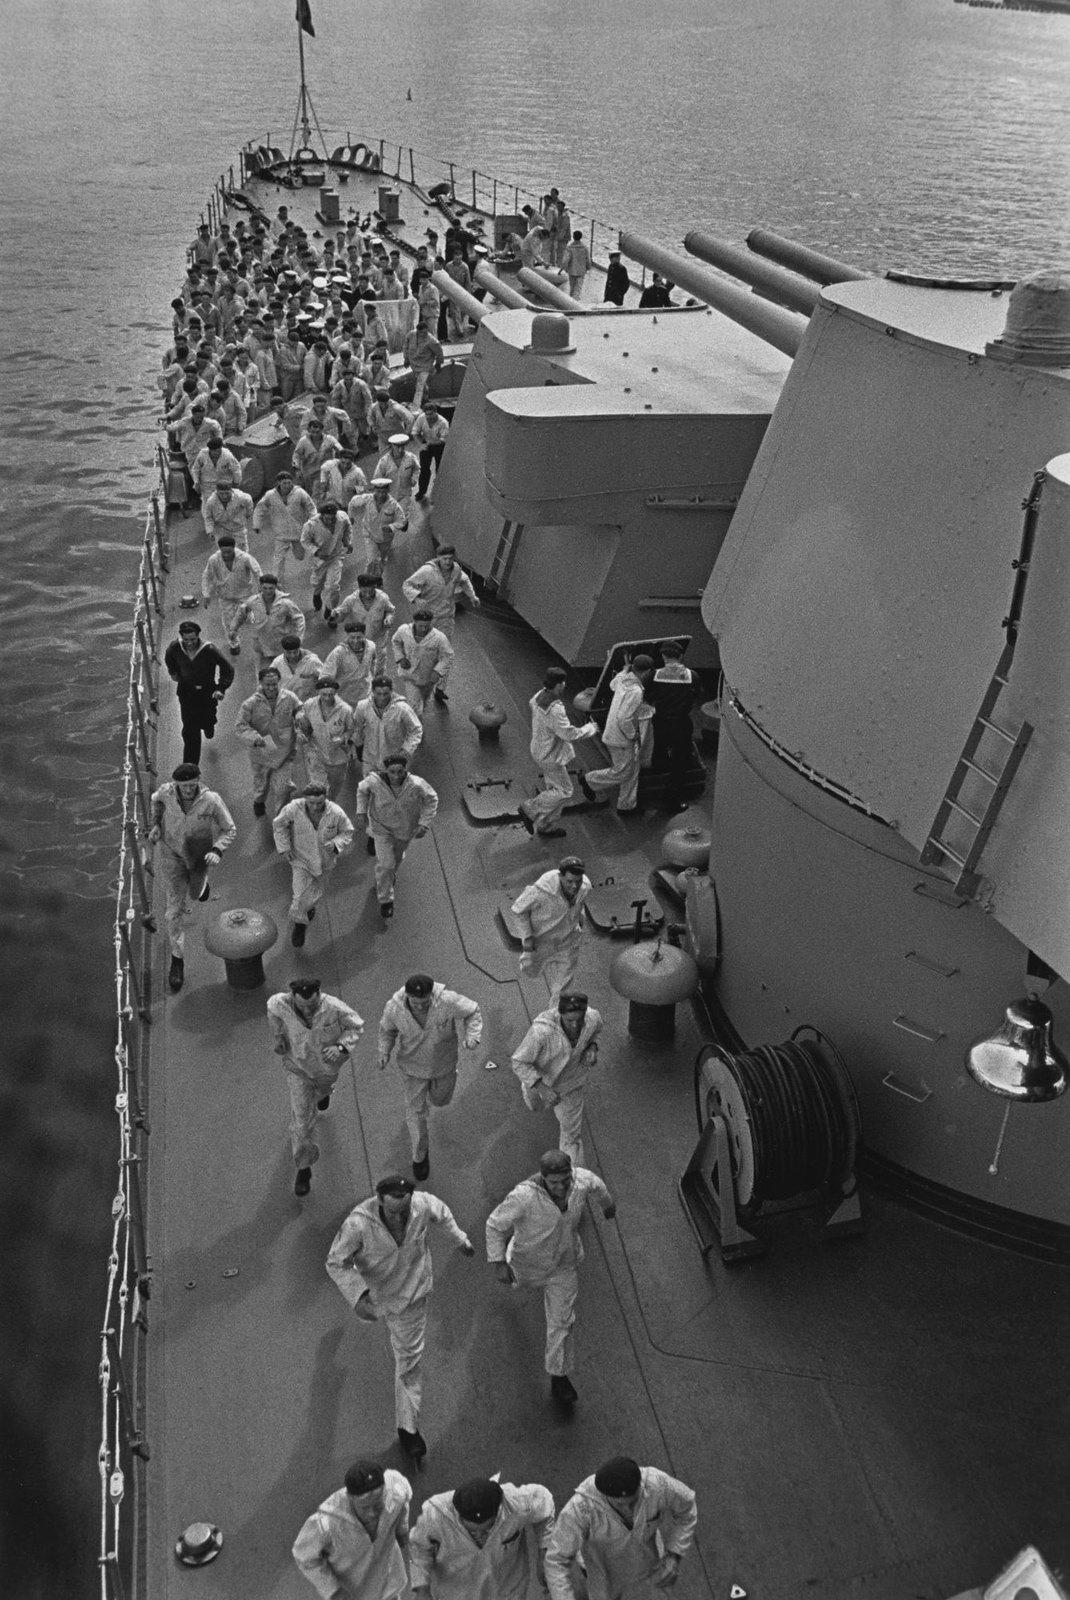 1950-е. На военном корабле